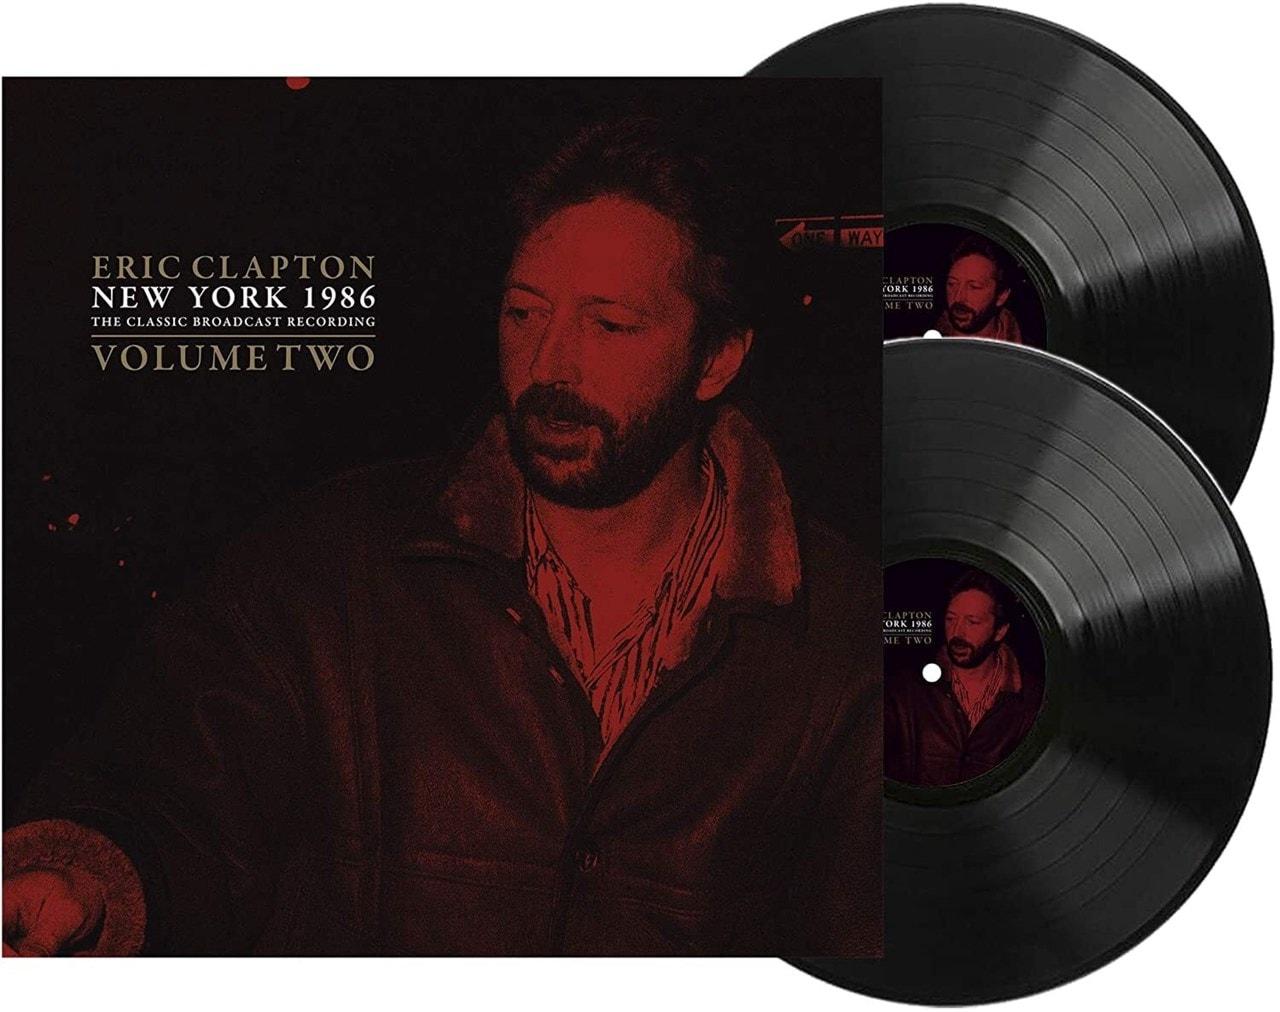 New York 1986: The Classic Broadcast Recording - Volume 2 - 1